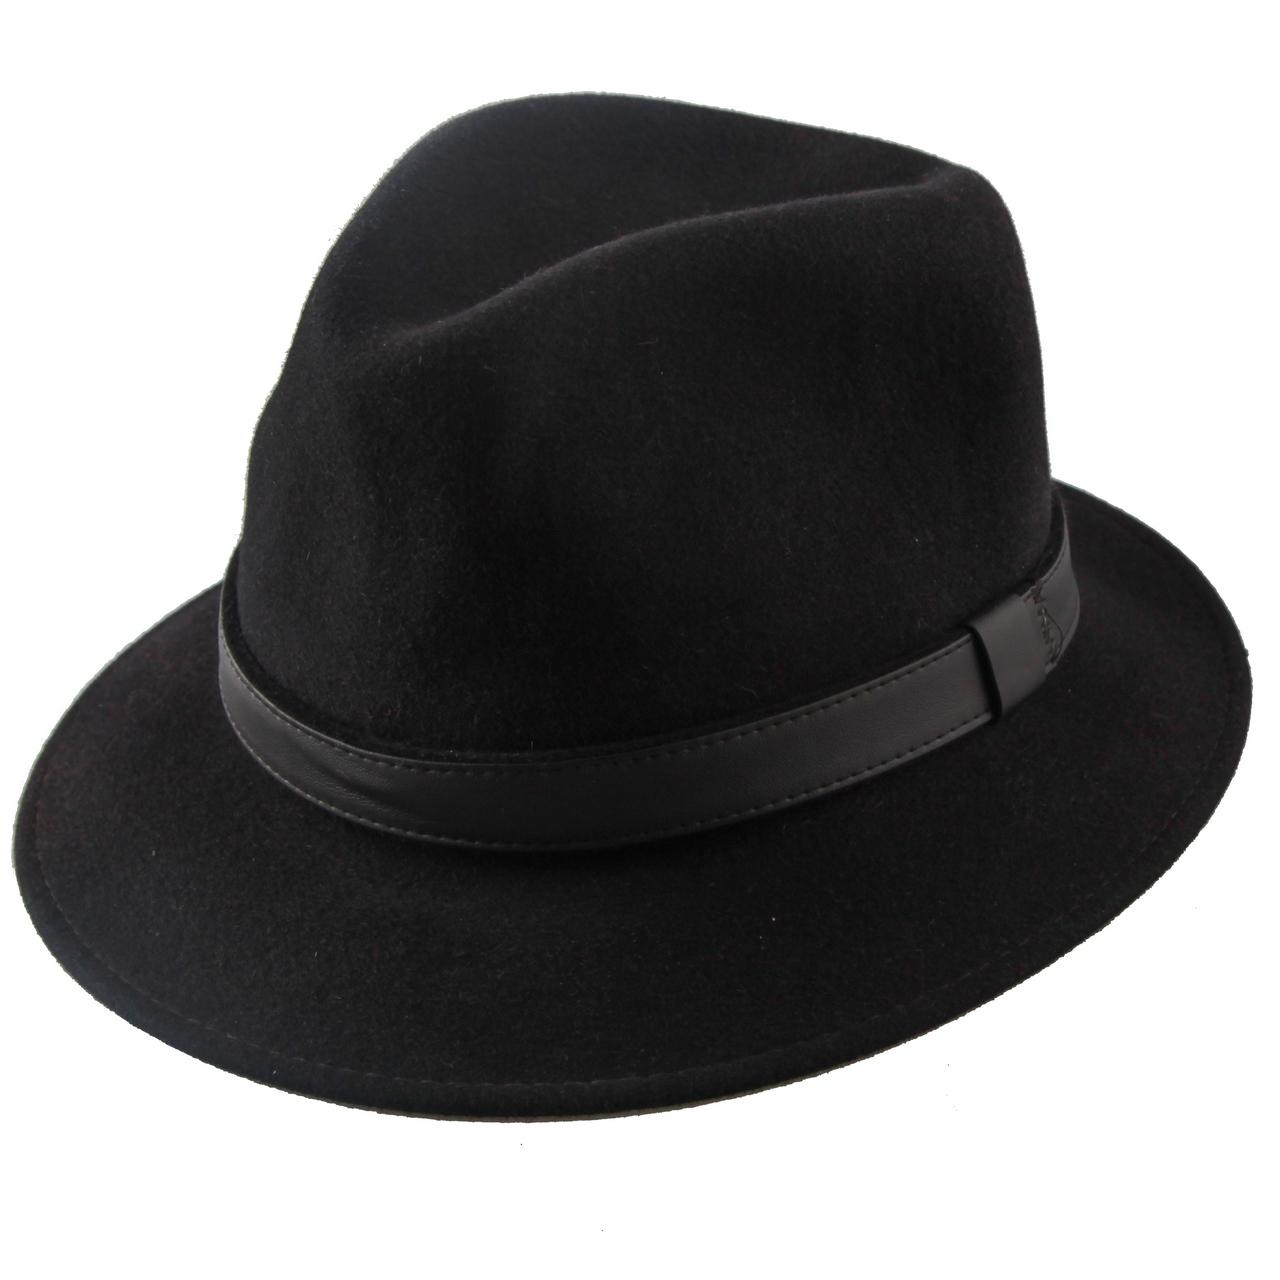 کلاه شاپو مردانه مایزر مدل MA-3 thumb